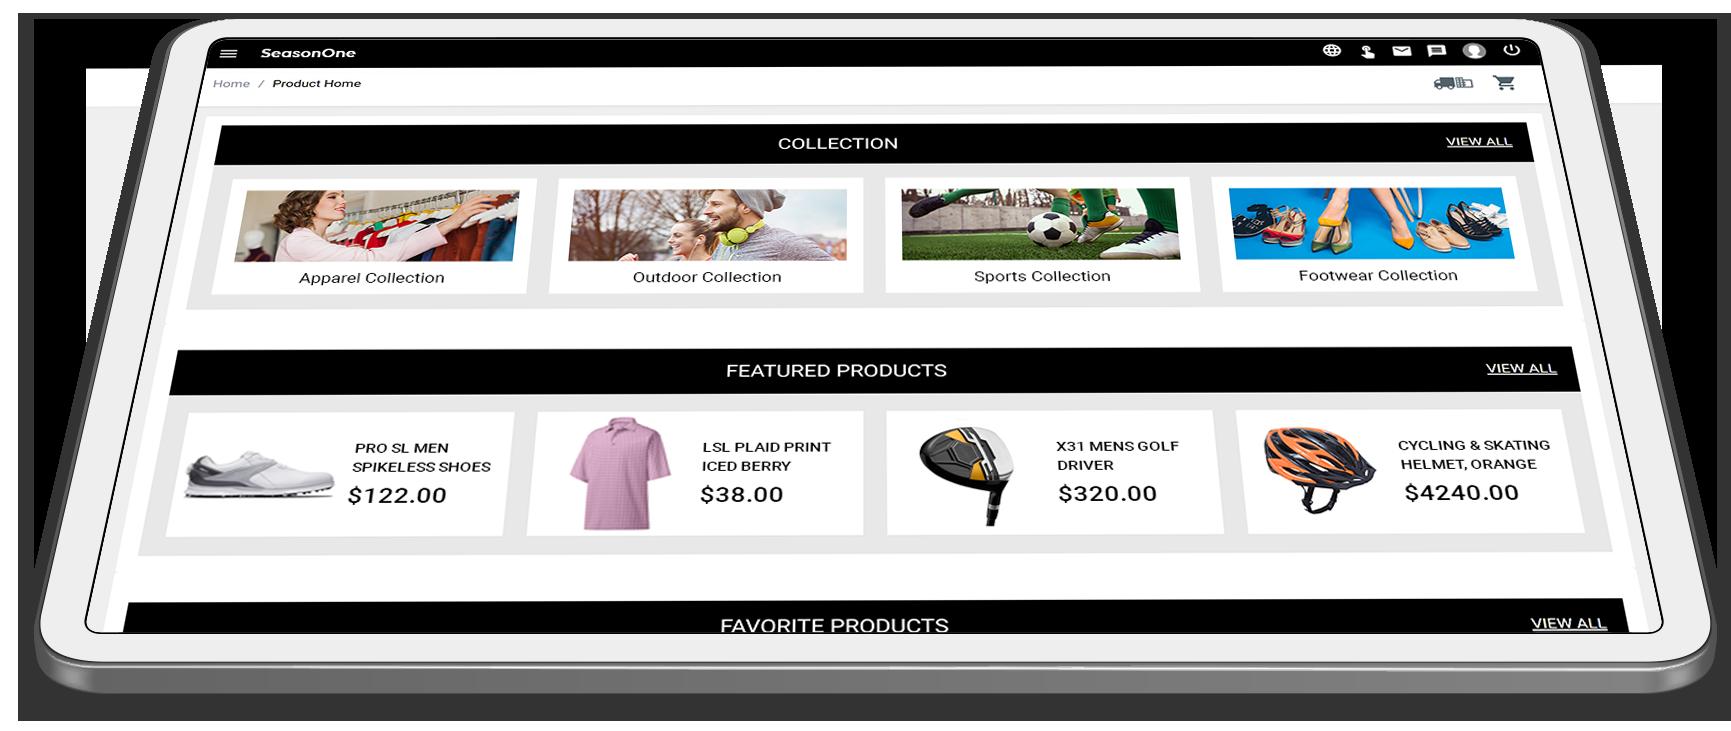 B2B Wholesale Ordering Software